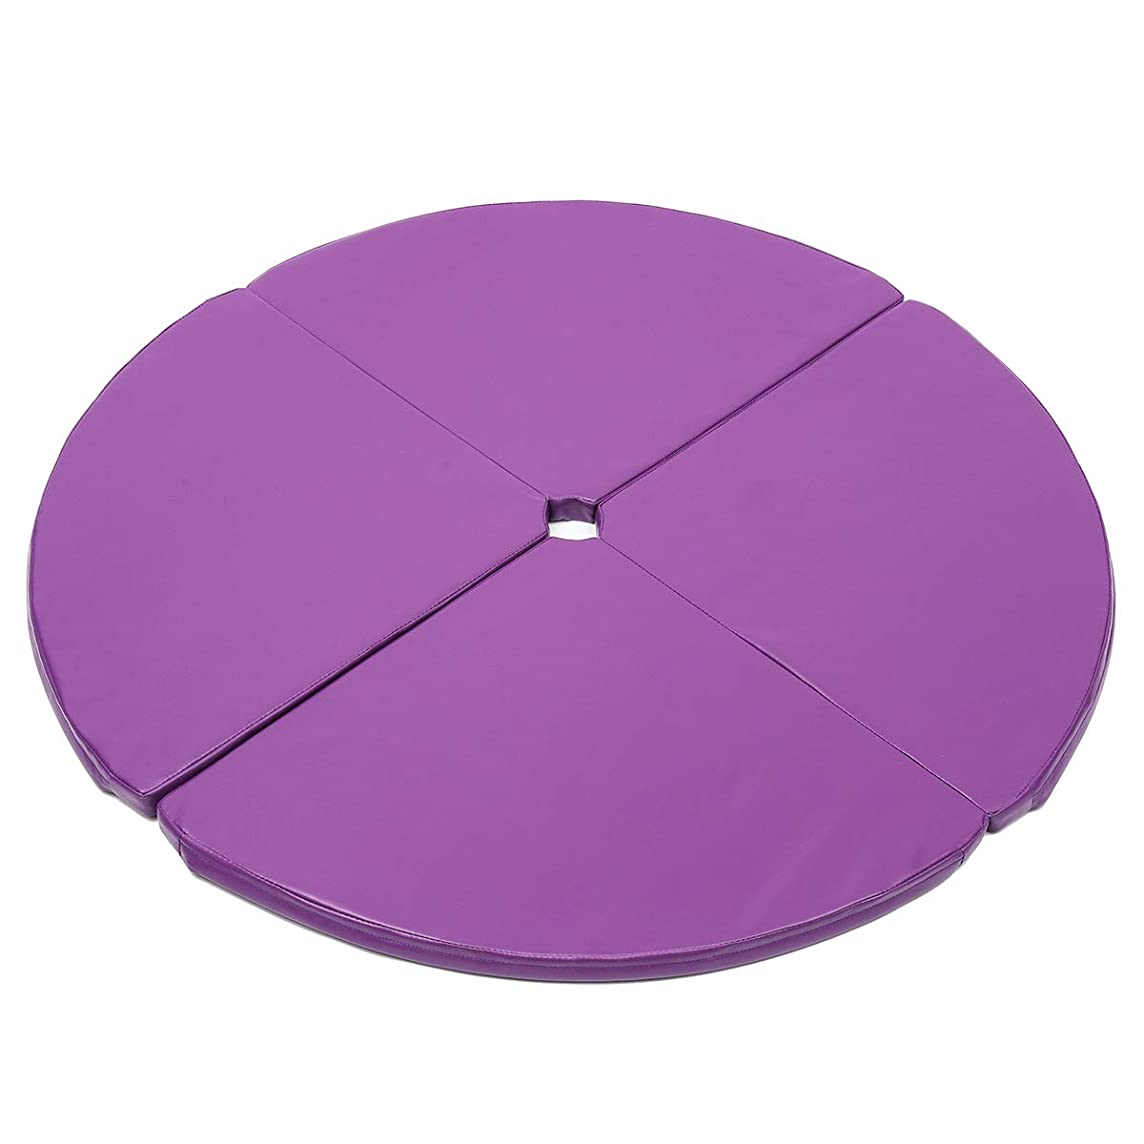 KingSo Pole Folding Crash Mat Fitness Cushion Yoga Exercise Steel Pipe Dance Mat Safety Padding, Diameter 47.24in